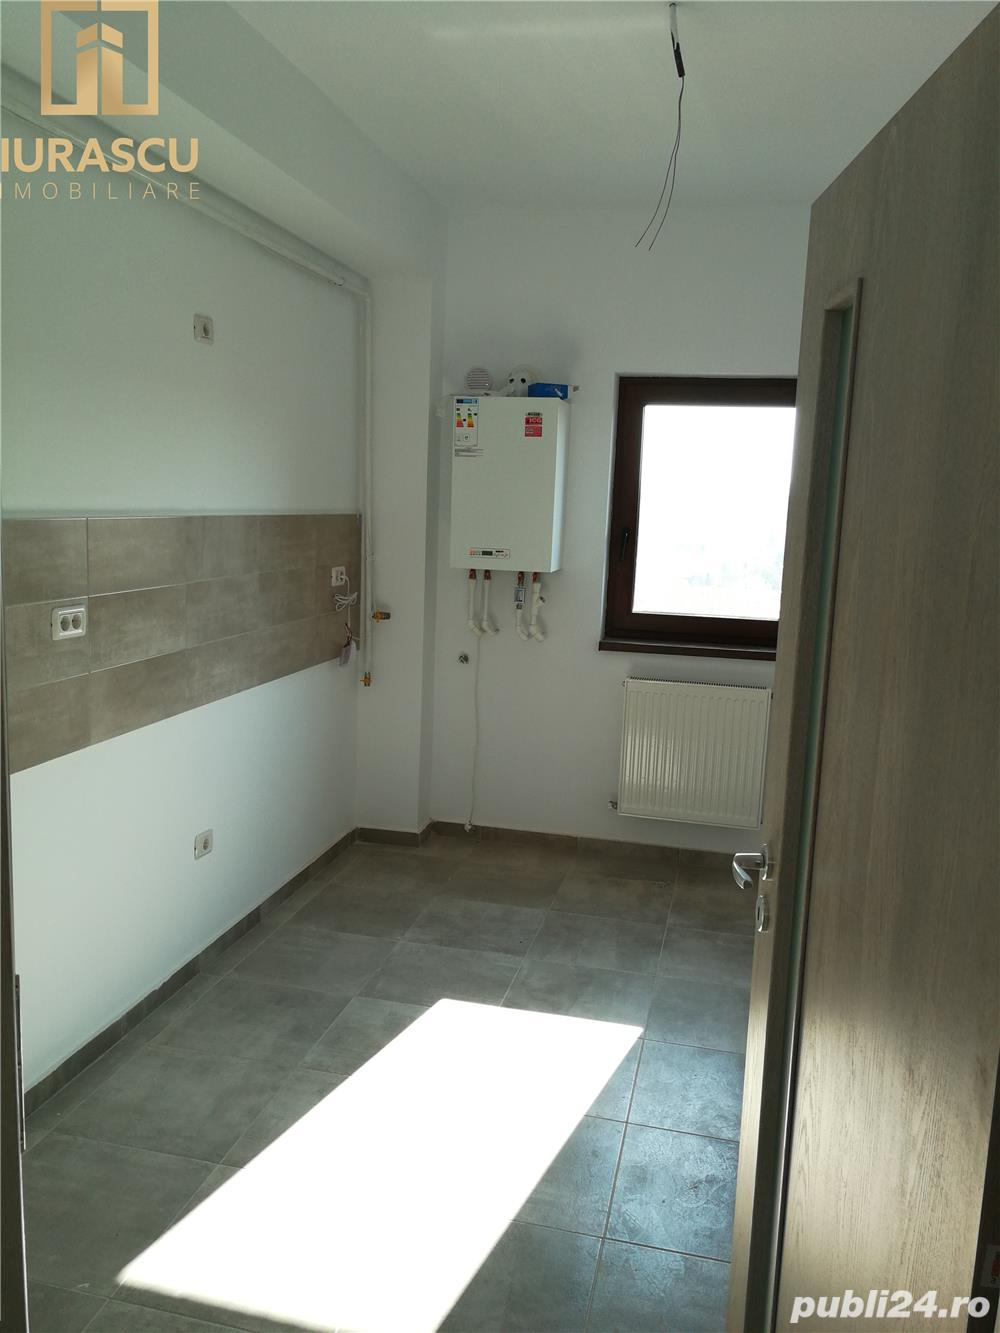 Apartament Nou 2 camere CUG- Lunca Cetatuii